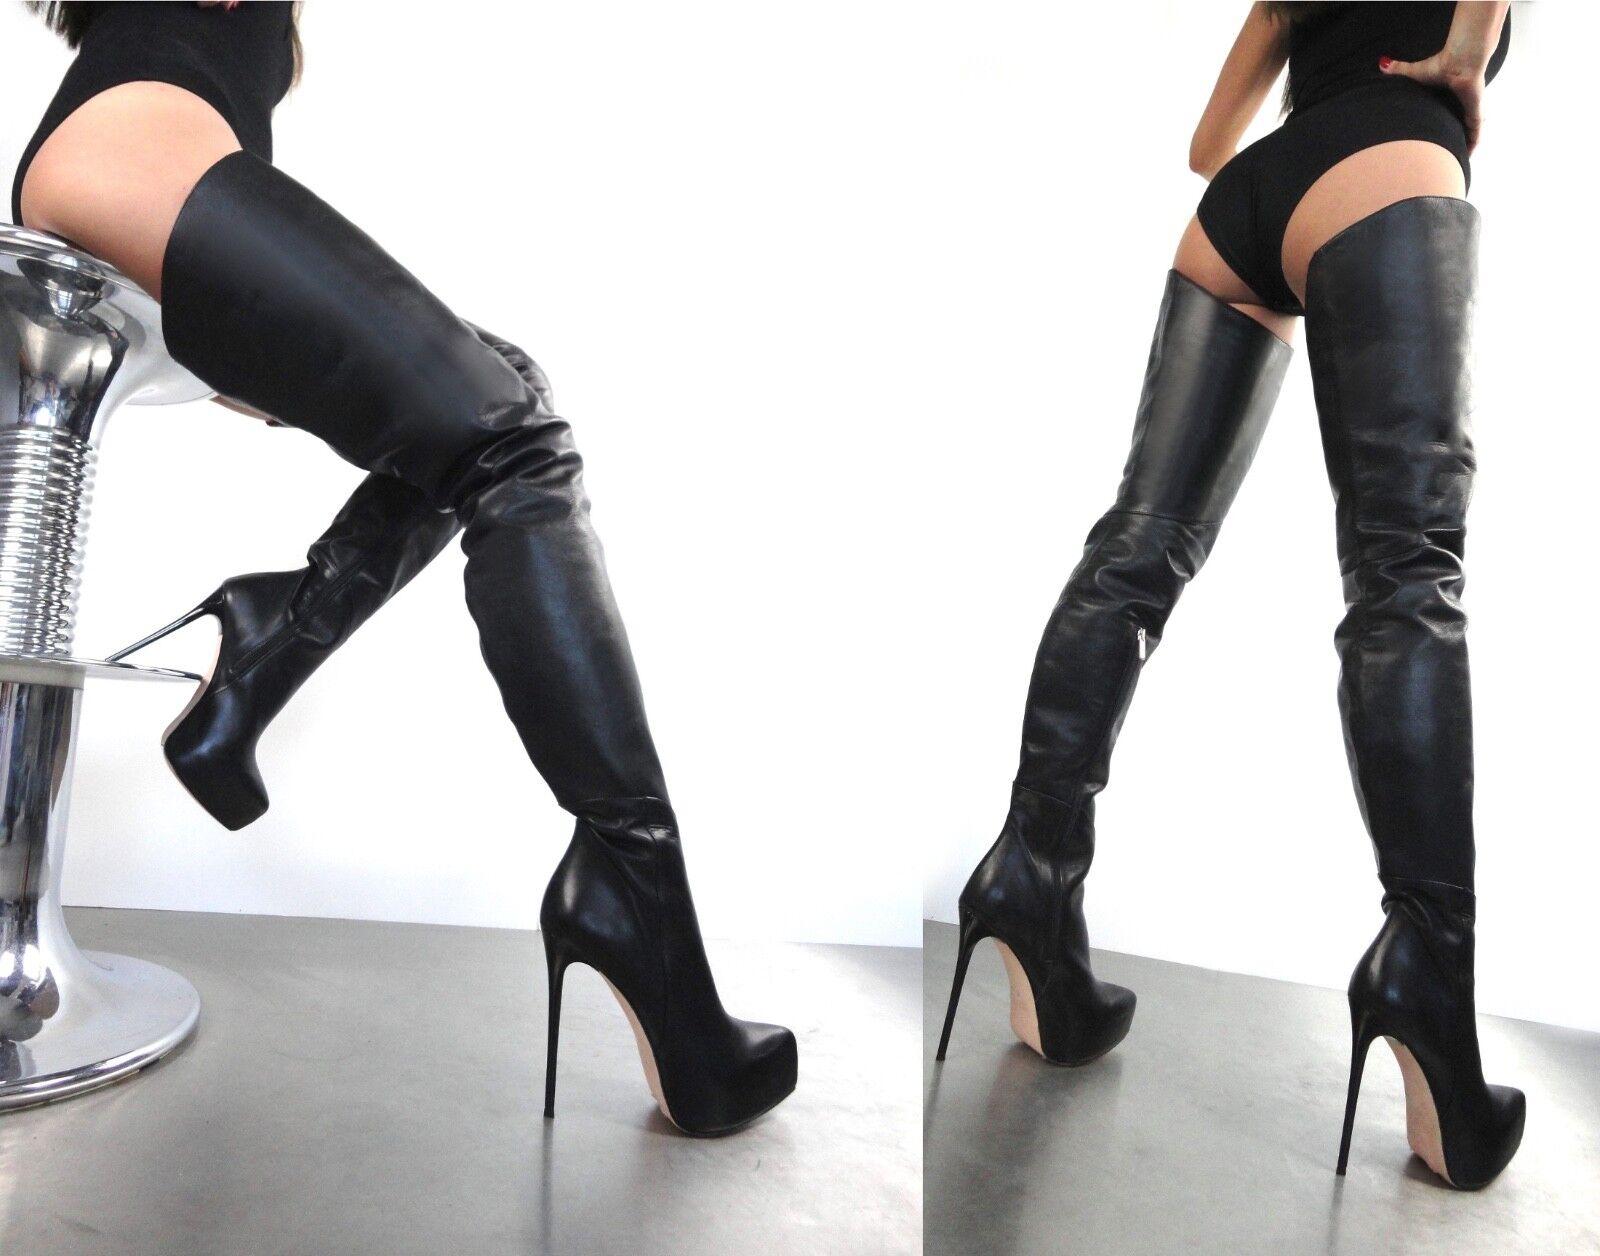 Cq Cq Cq Plataforma botas botas Personalizado OVERKNEE Couture botas De Cuero Negro Negro 44  gran venta